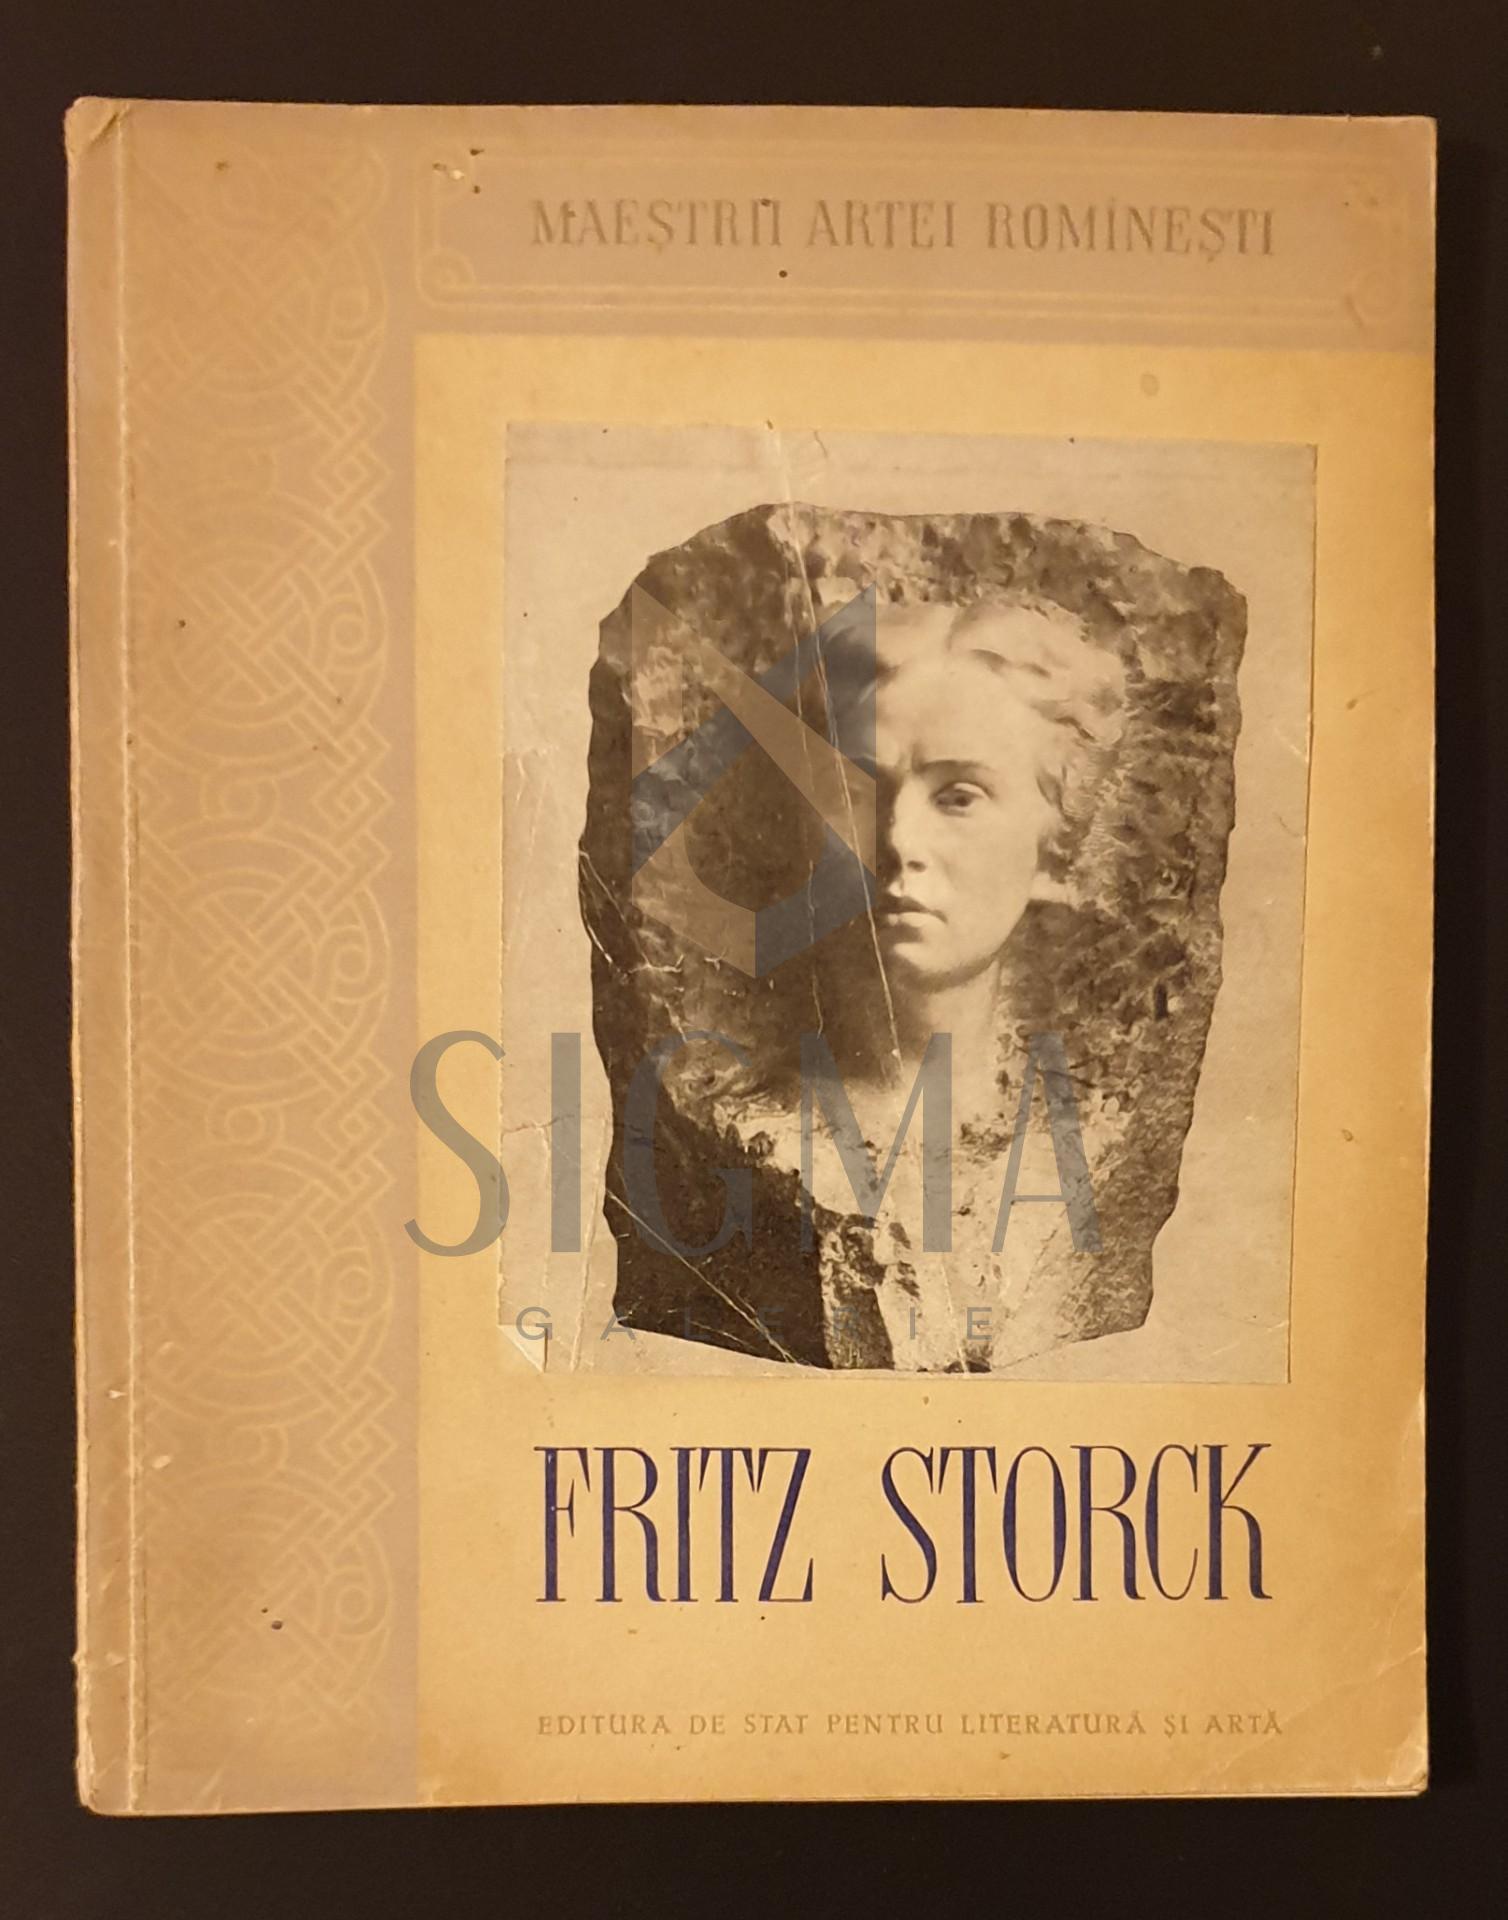 Fritz Storck